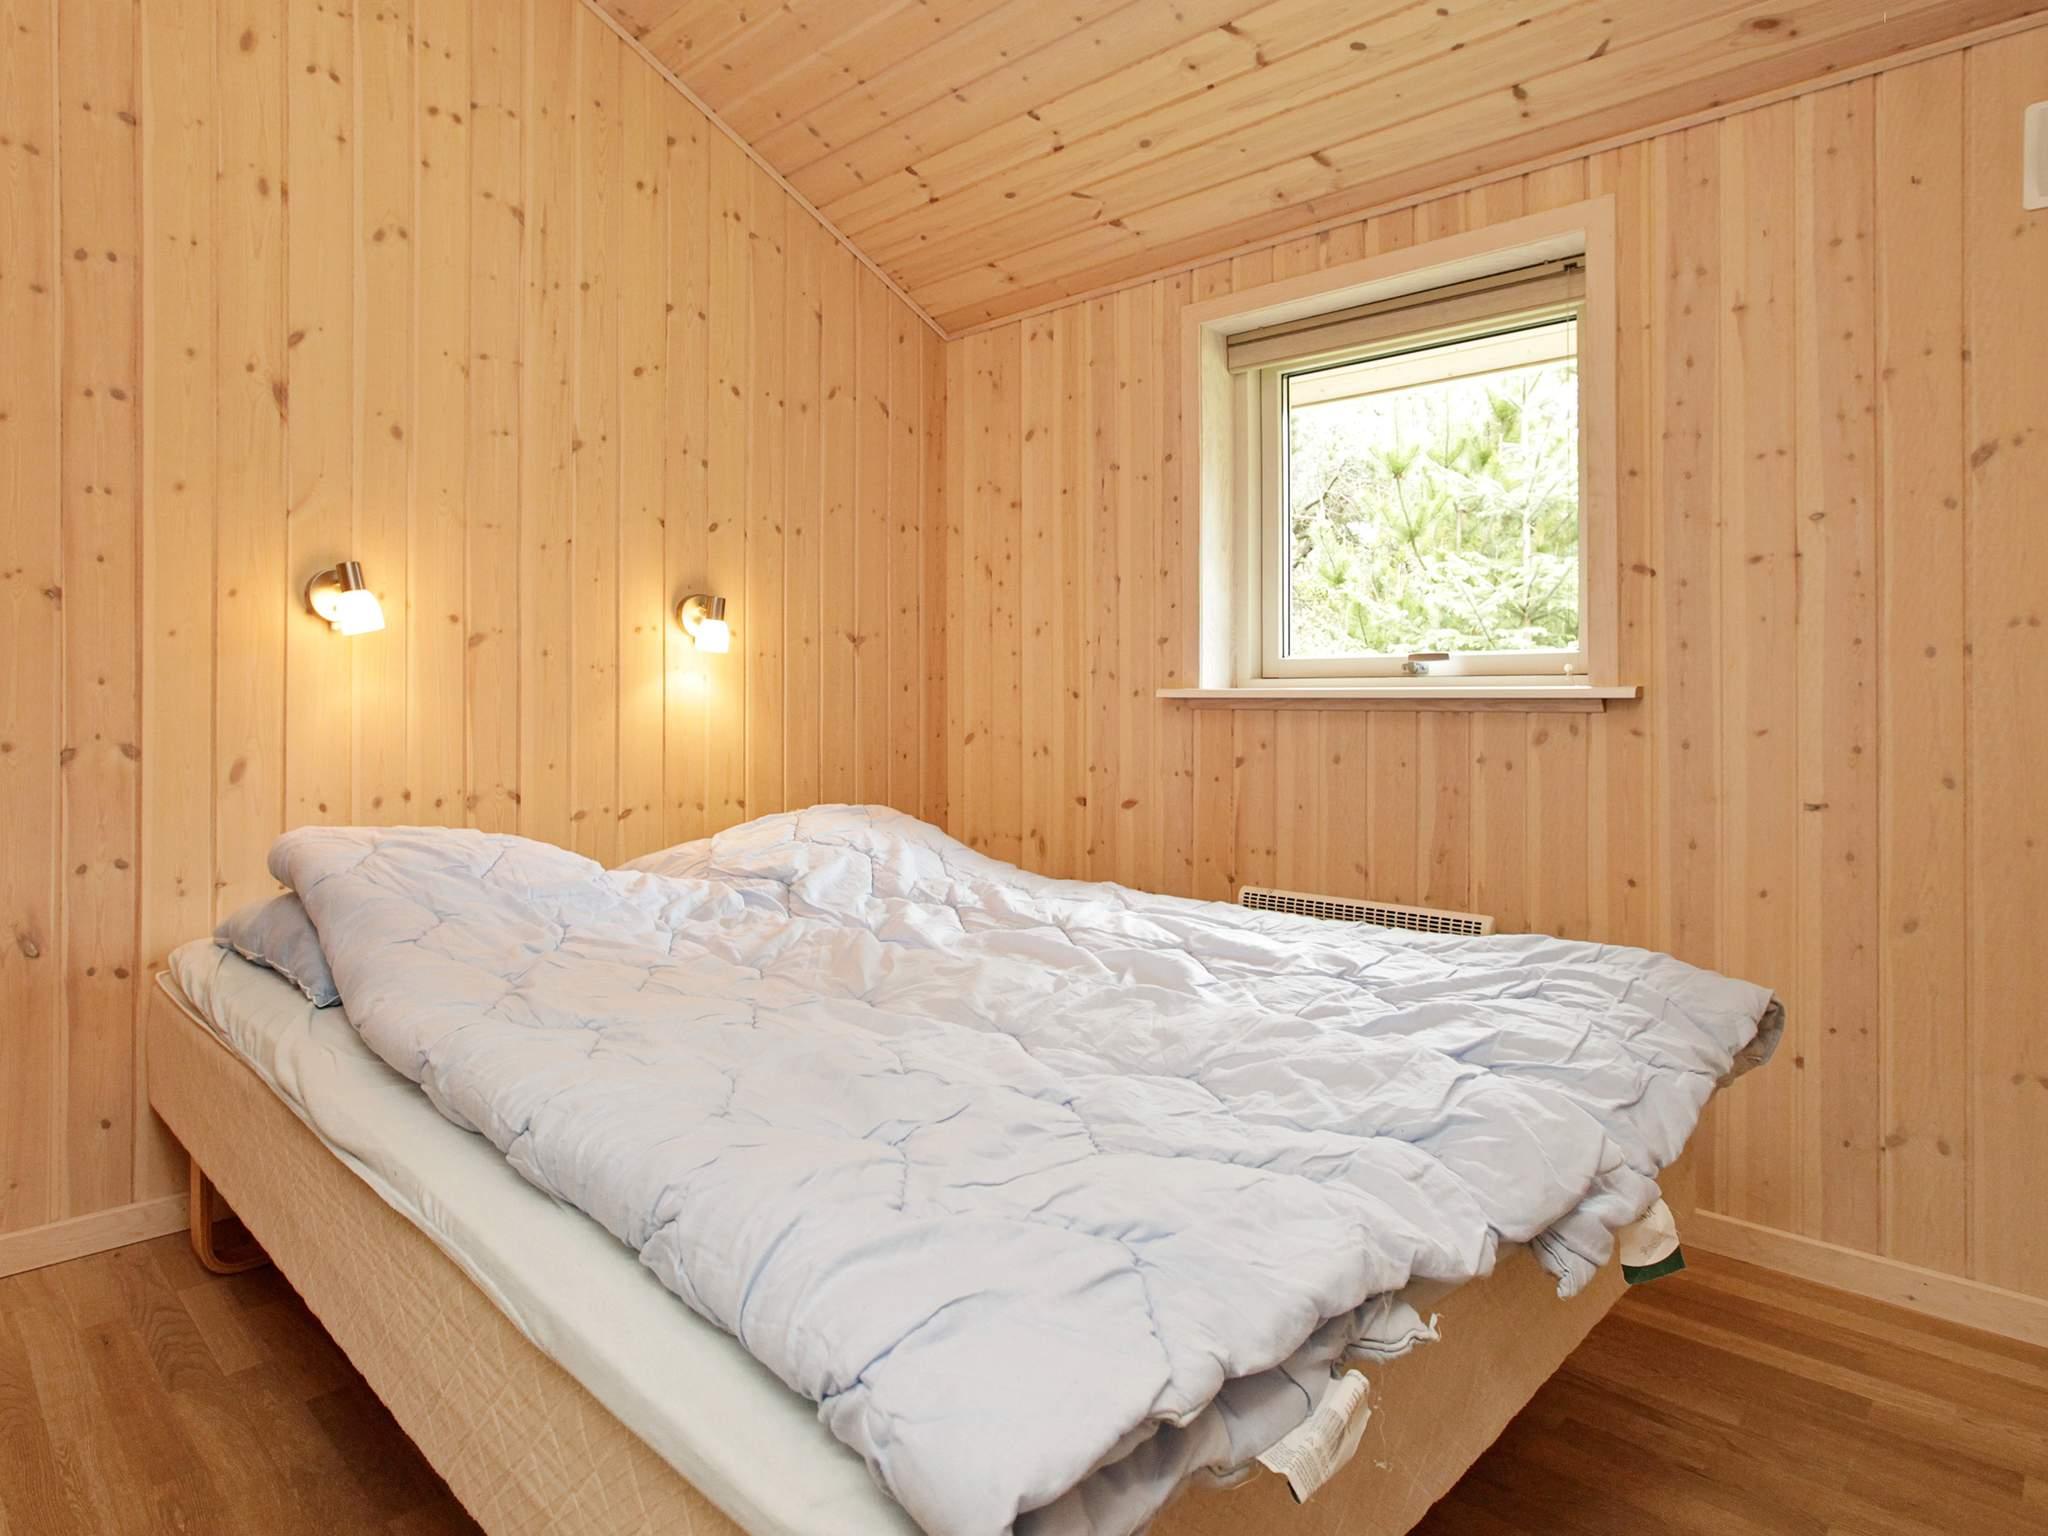 Ferienhaus Blåvand (125757), Blåvand, , Westjütland, Dänemark, Bild 12